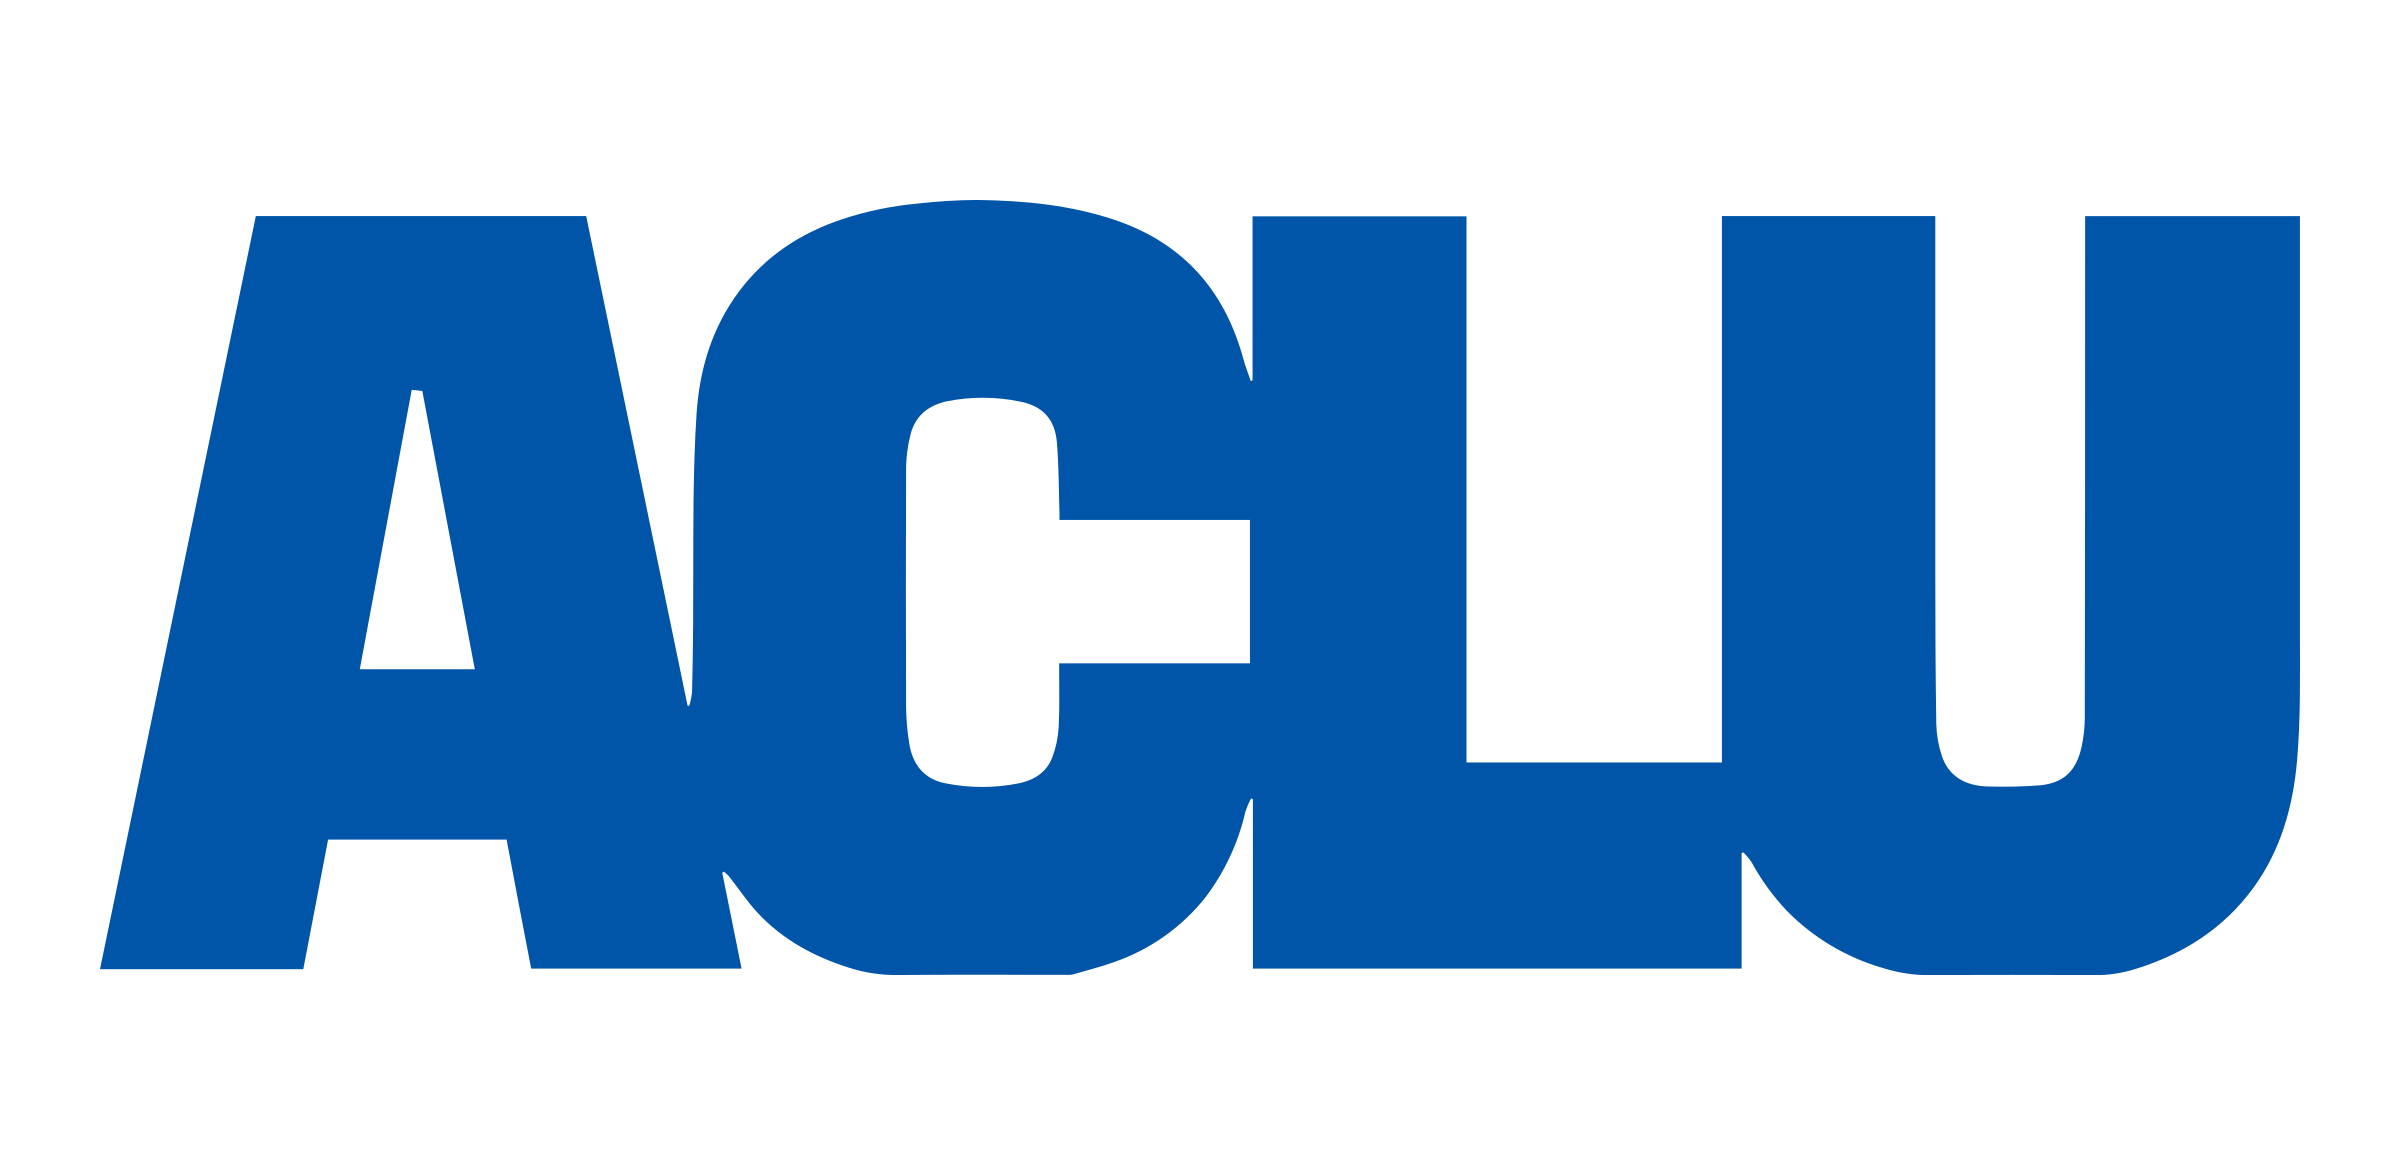 ACLU Logo PNG Transparent & SVG Vector.